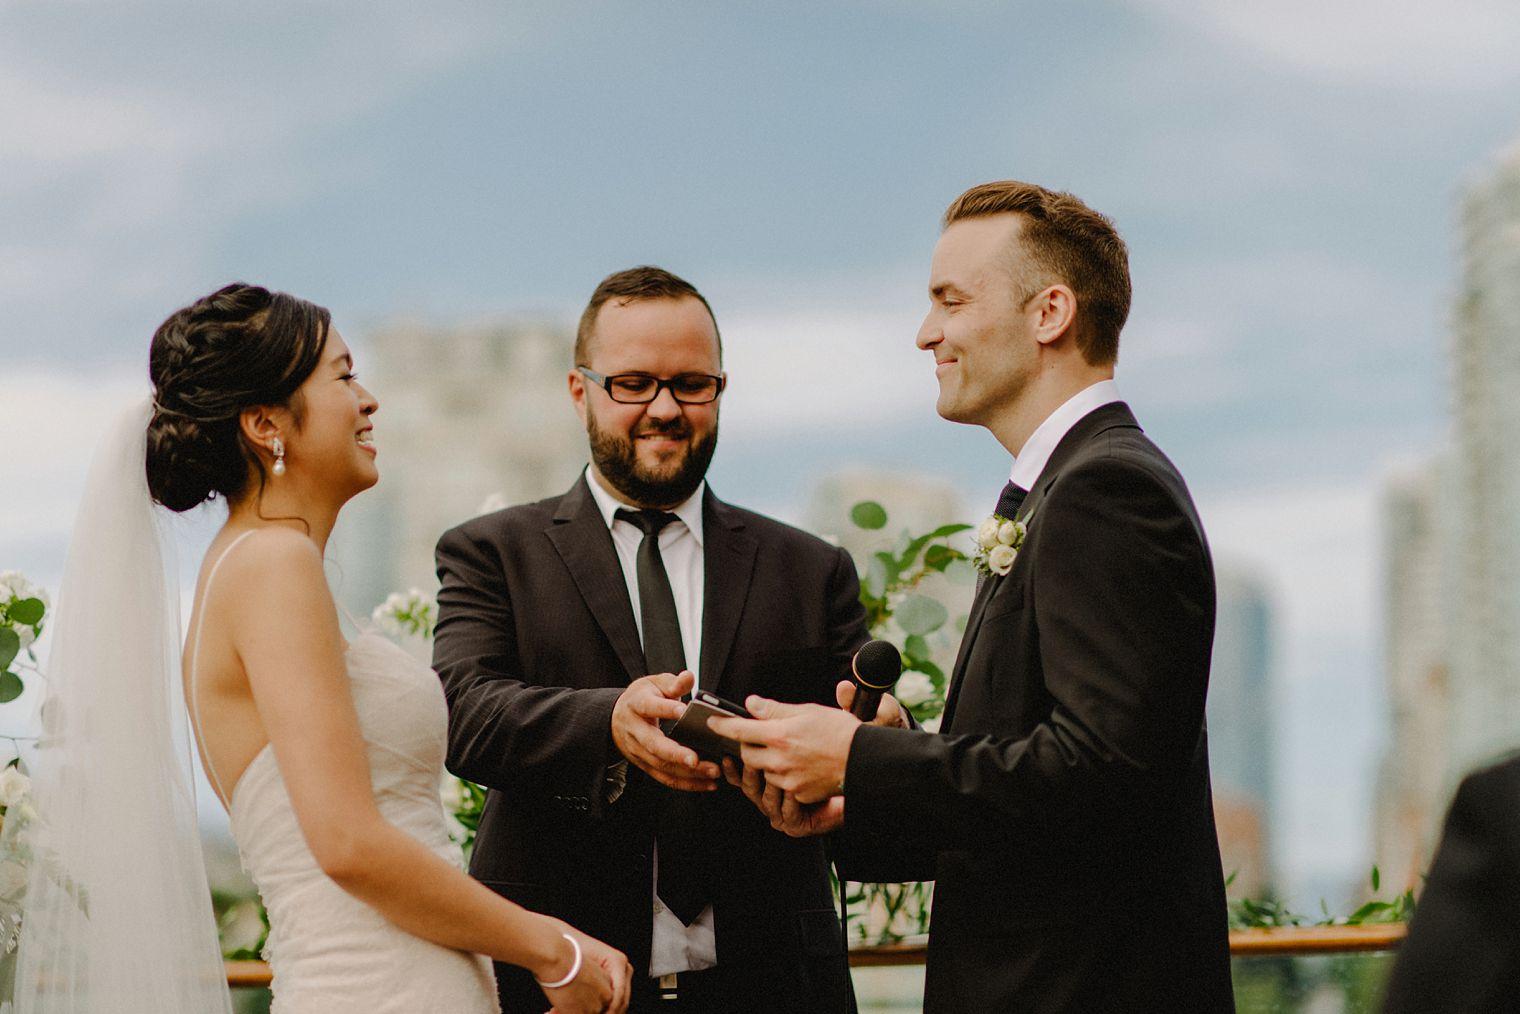 granville island wedding ceremony in vancouver